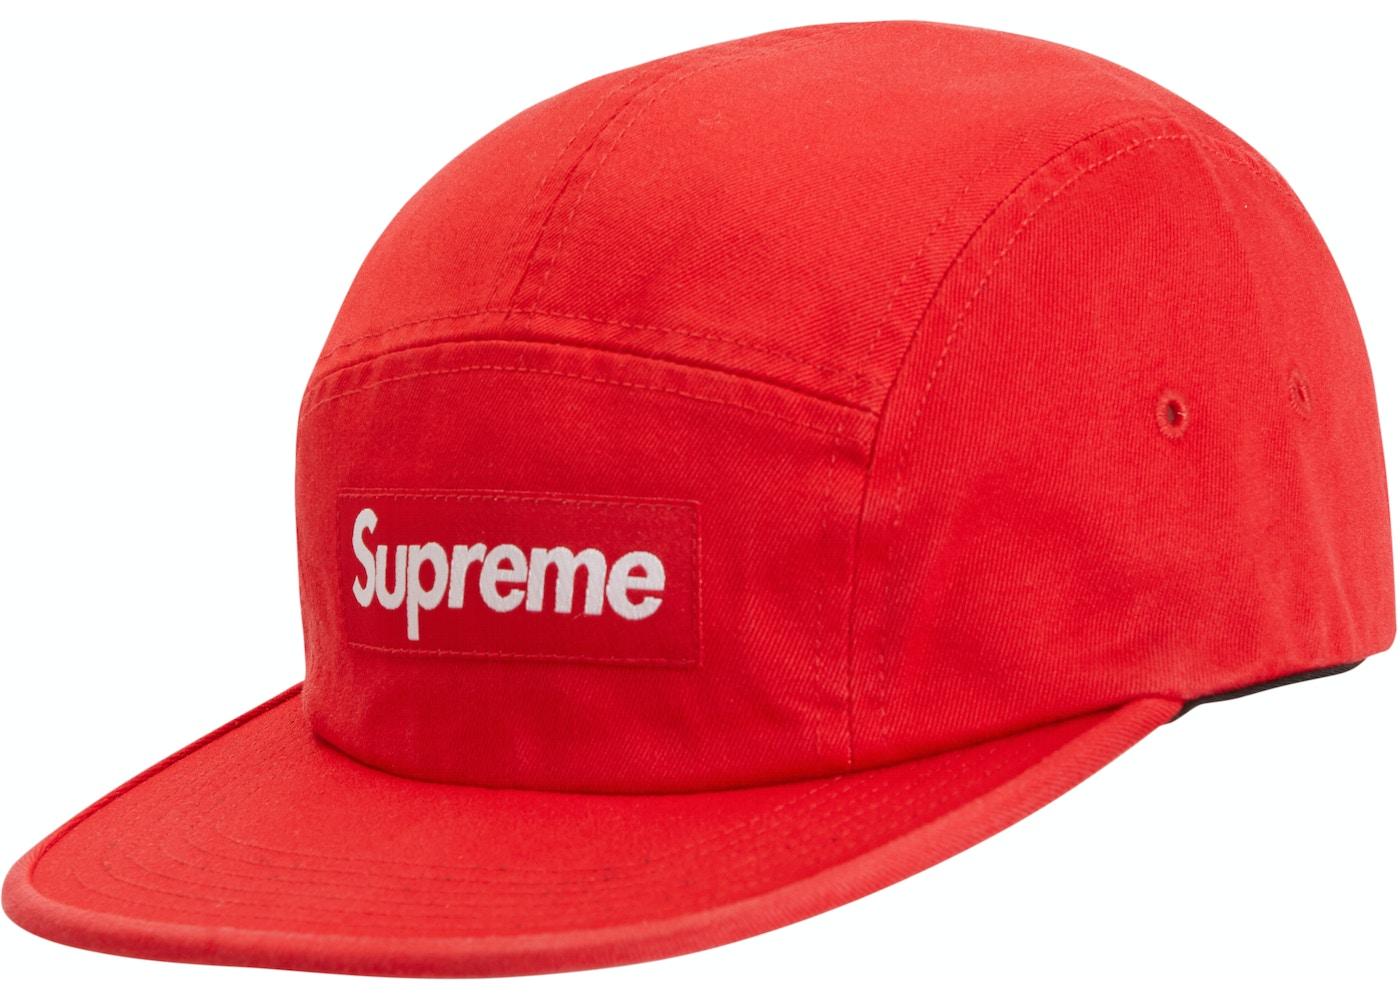 76ad0bad822 Supreme Headwear - Buy   Sell Streetwear